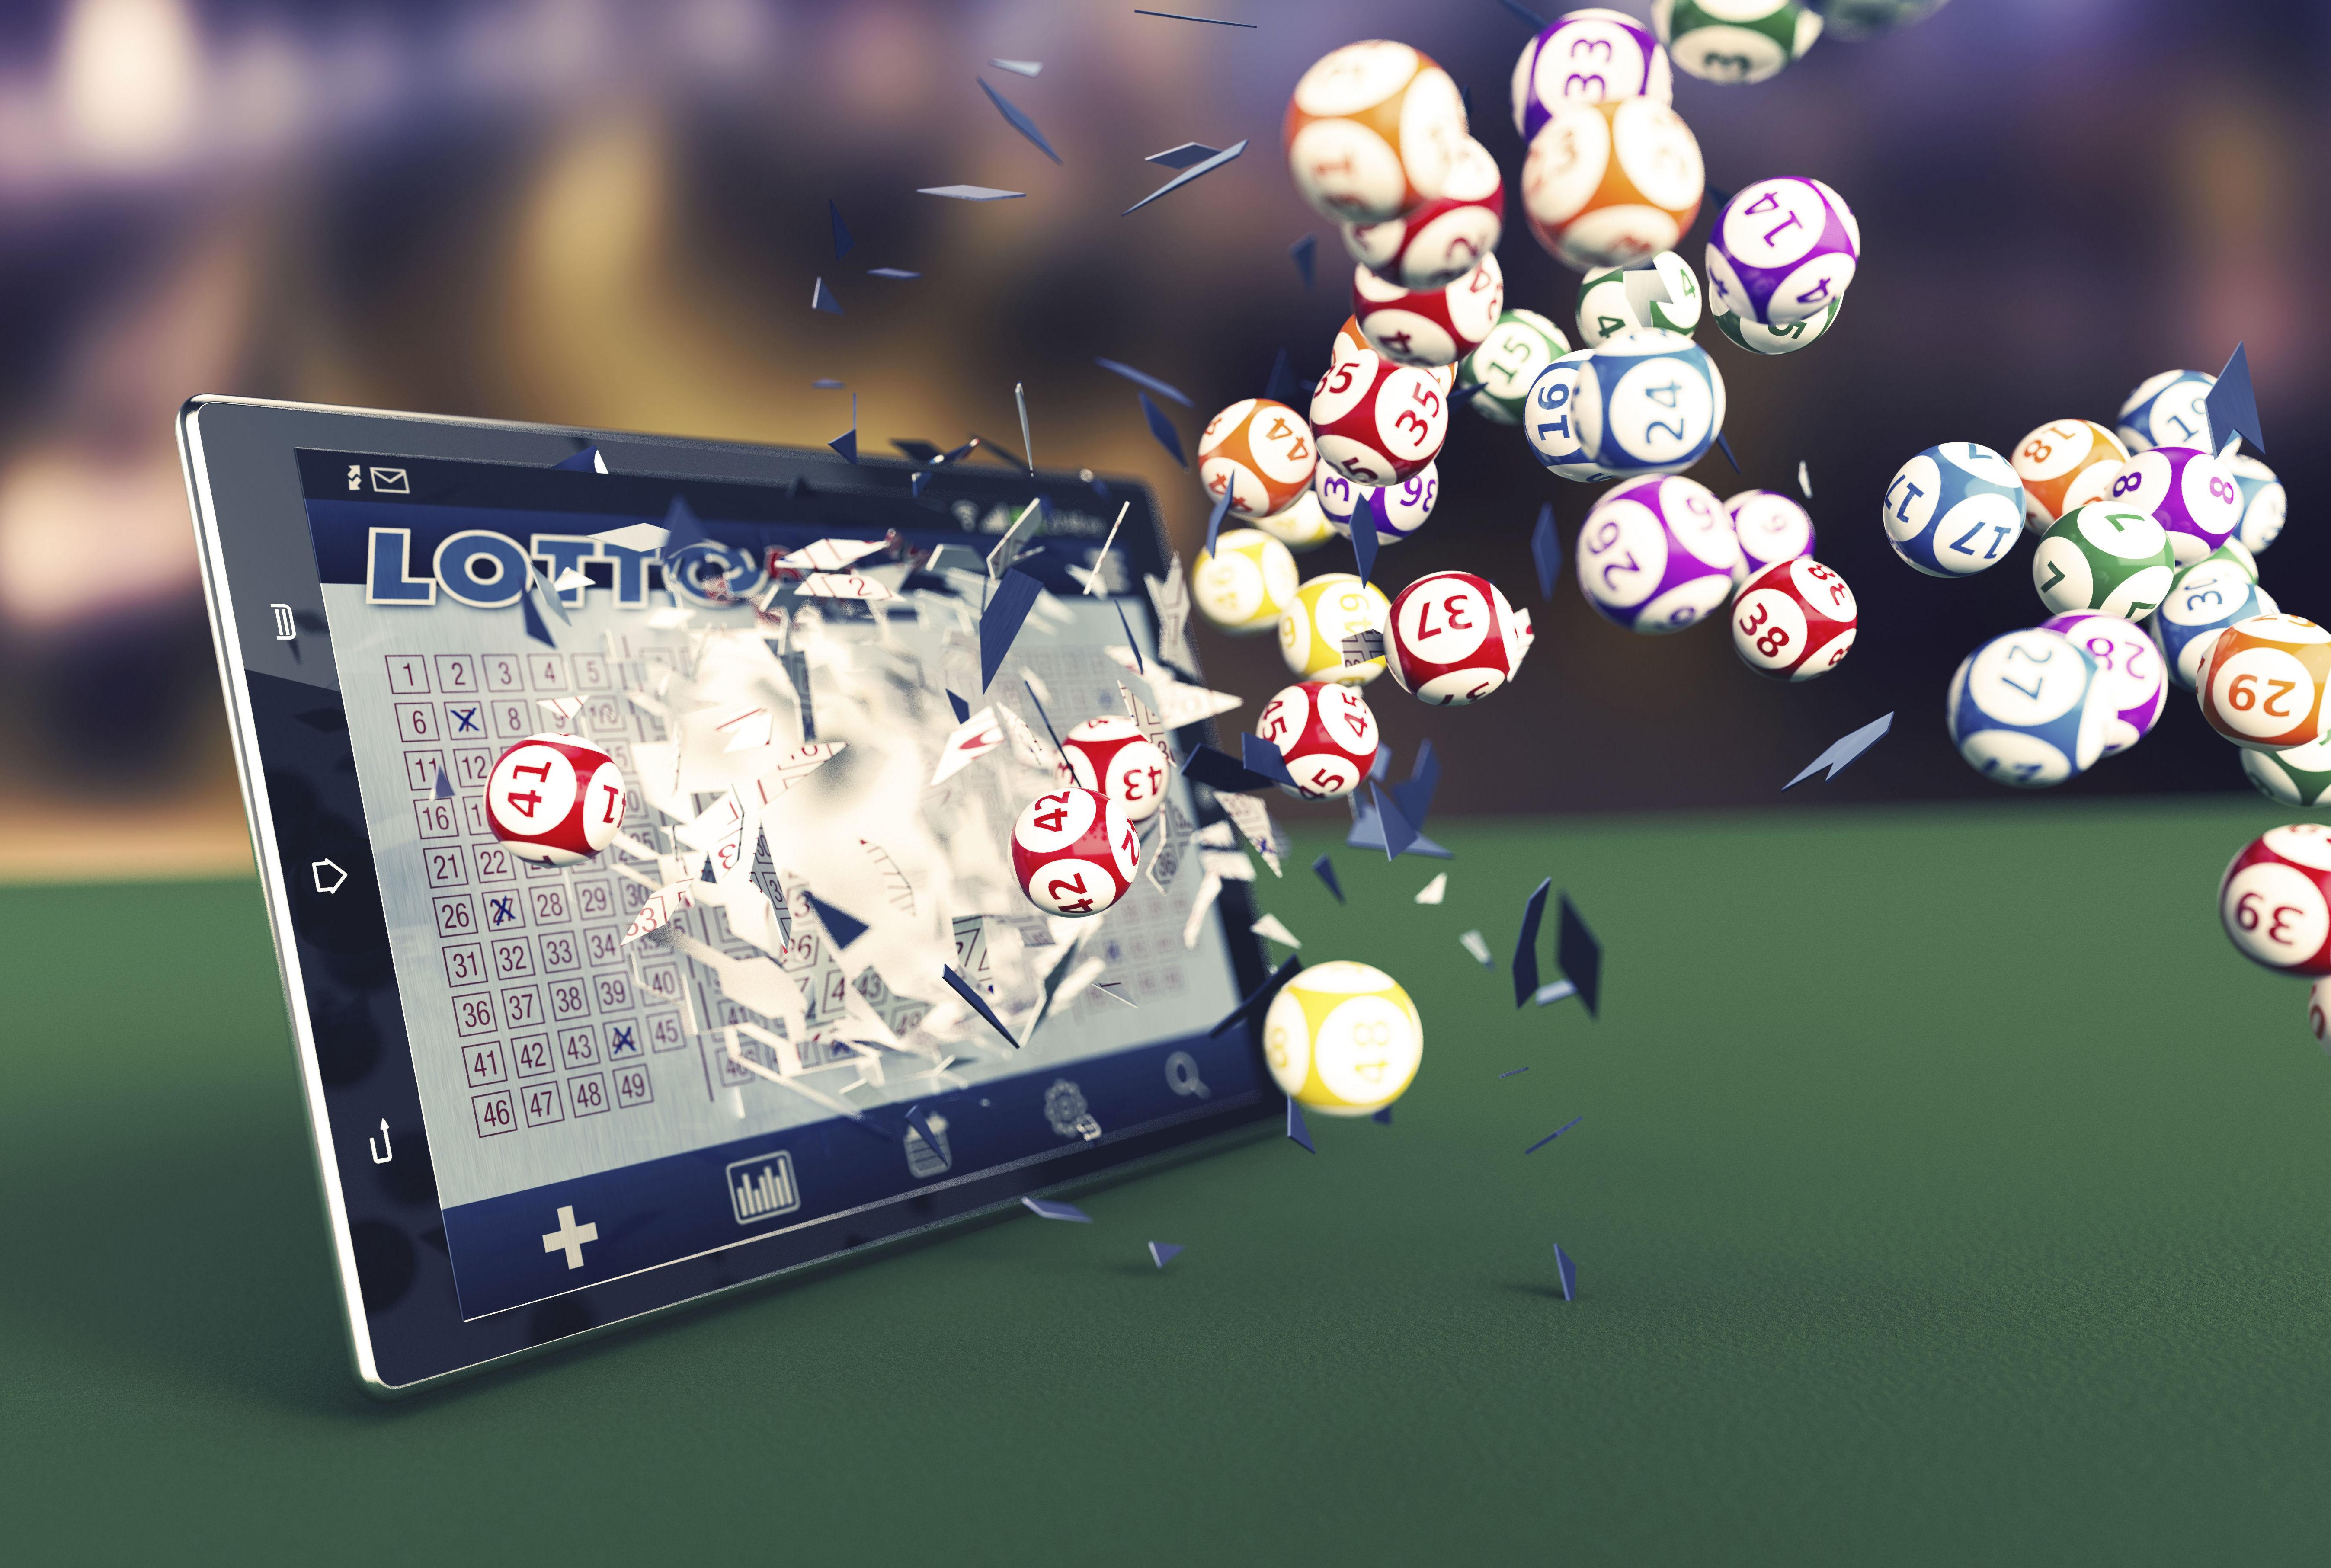 Lotería por internet